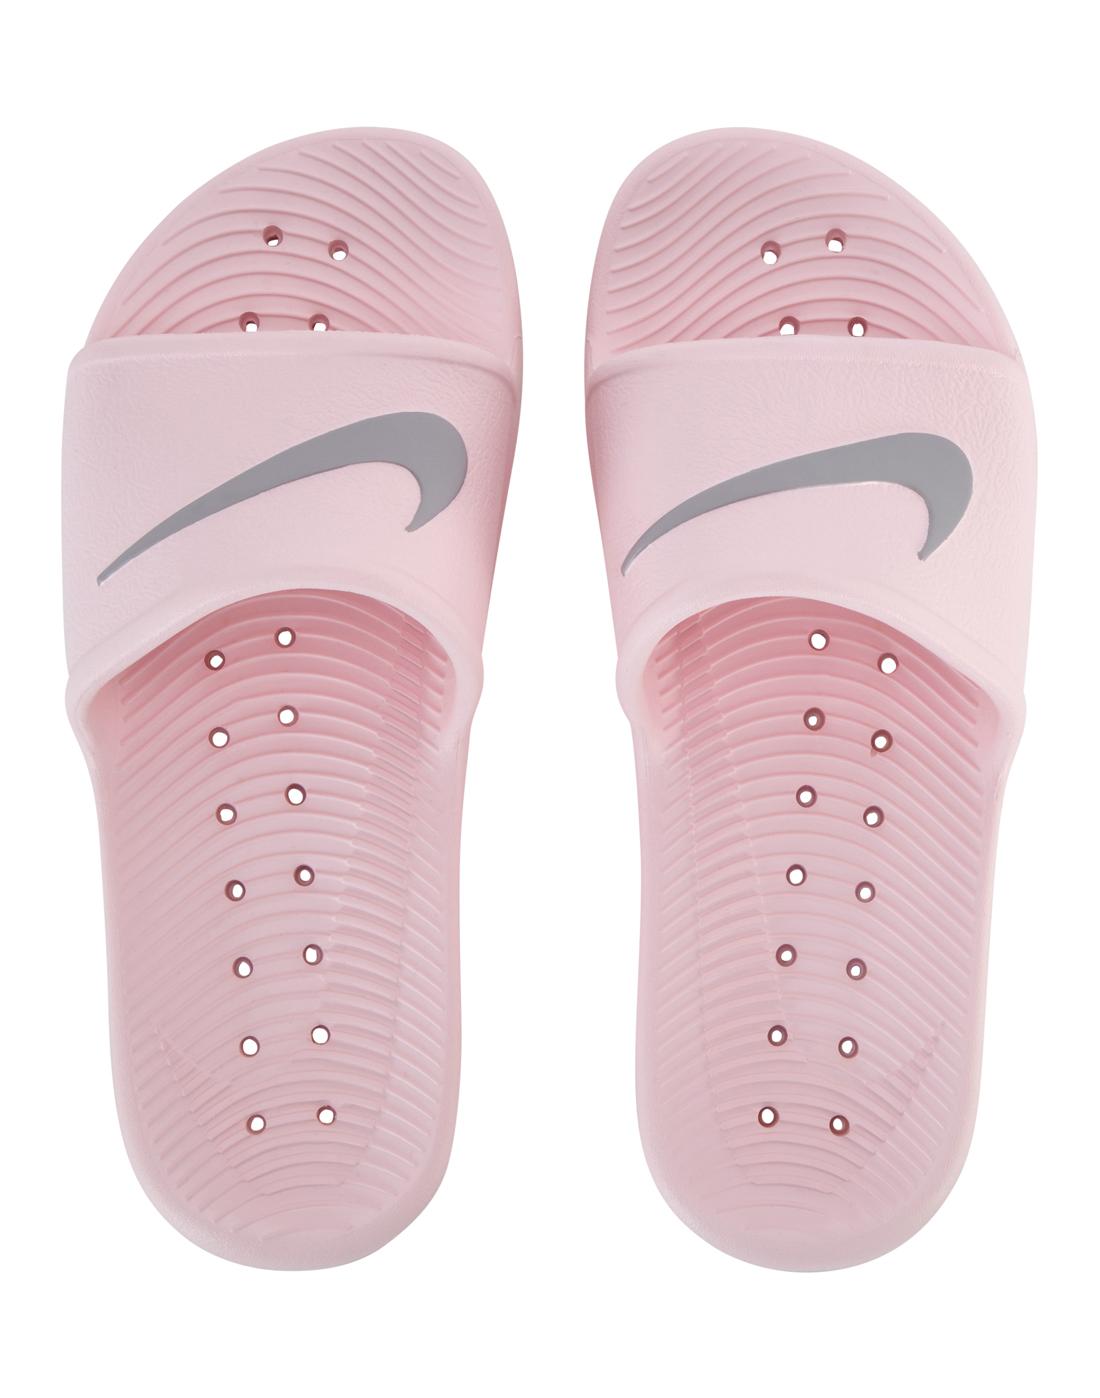 check out d3d42 5e538 Nike Womens Kawa Shower Slides   Life Style Sports nike kawa slide women s  pink